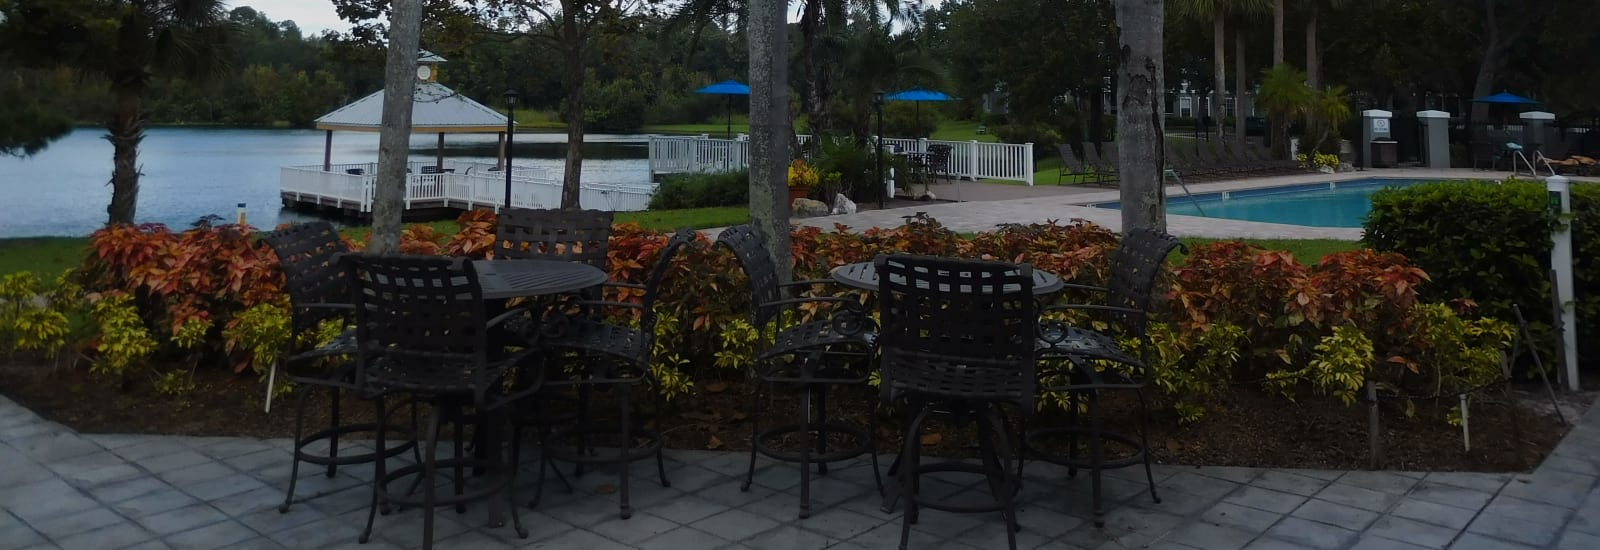 Tampa FL Apartments